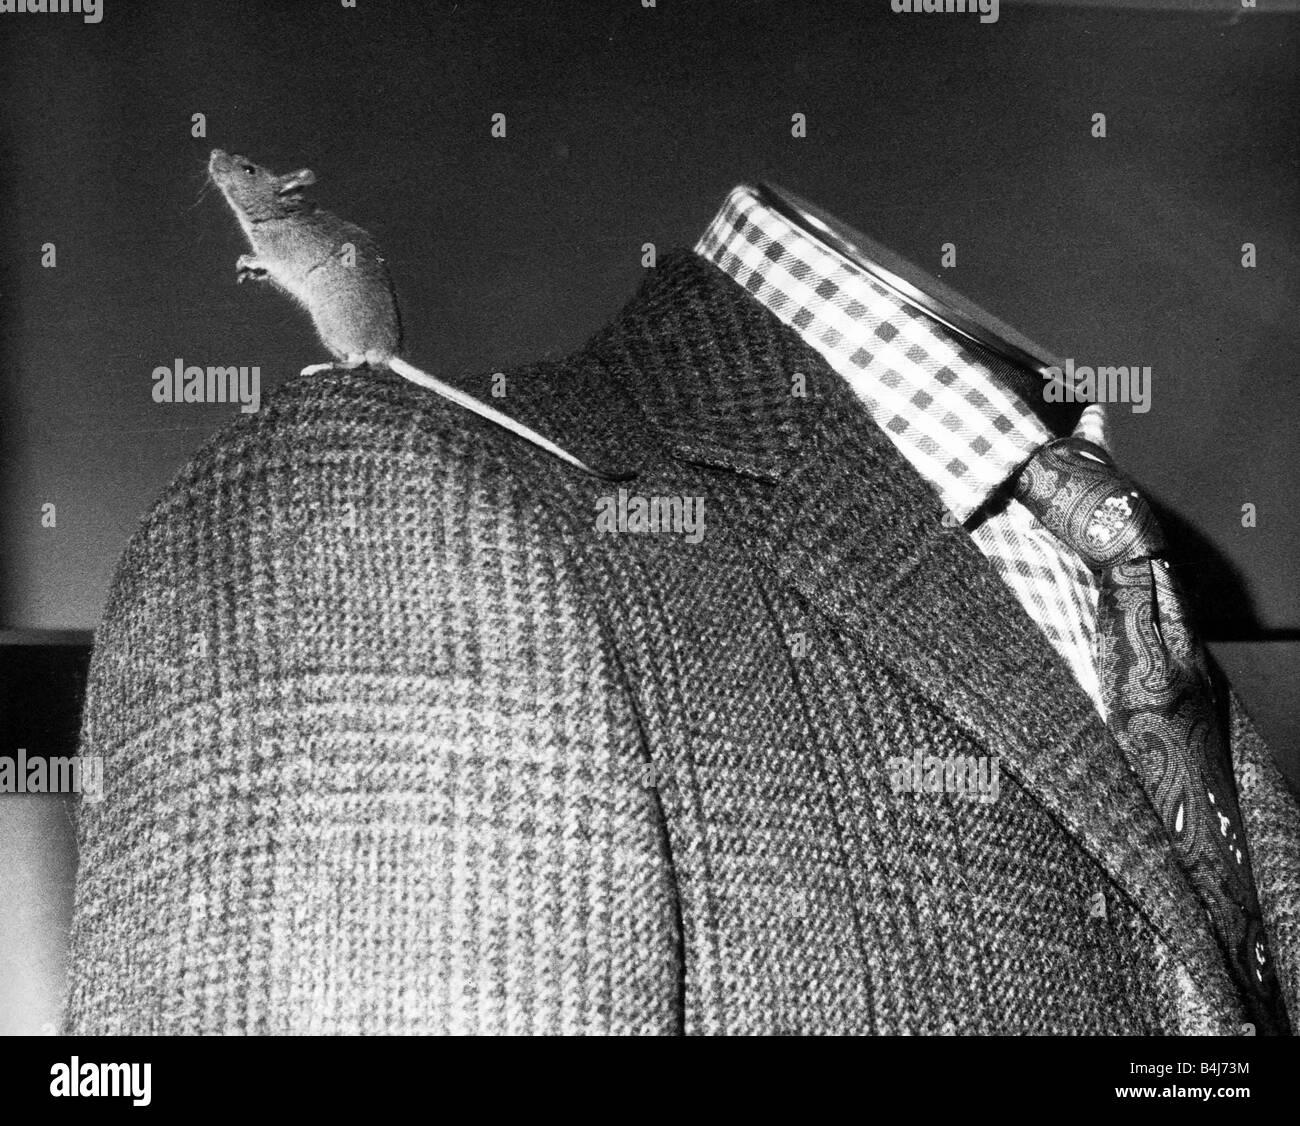 Men\'s Tailors Stockfotos & Men\'s Tailors Bilder - Alamy